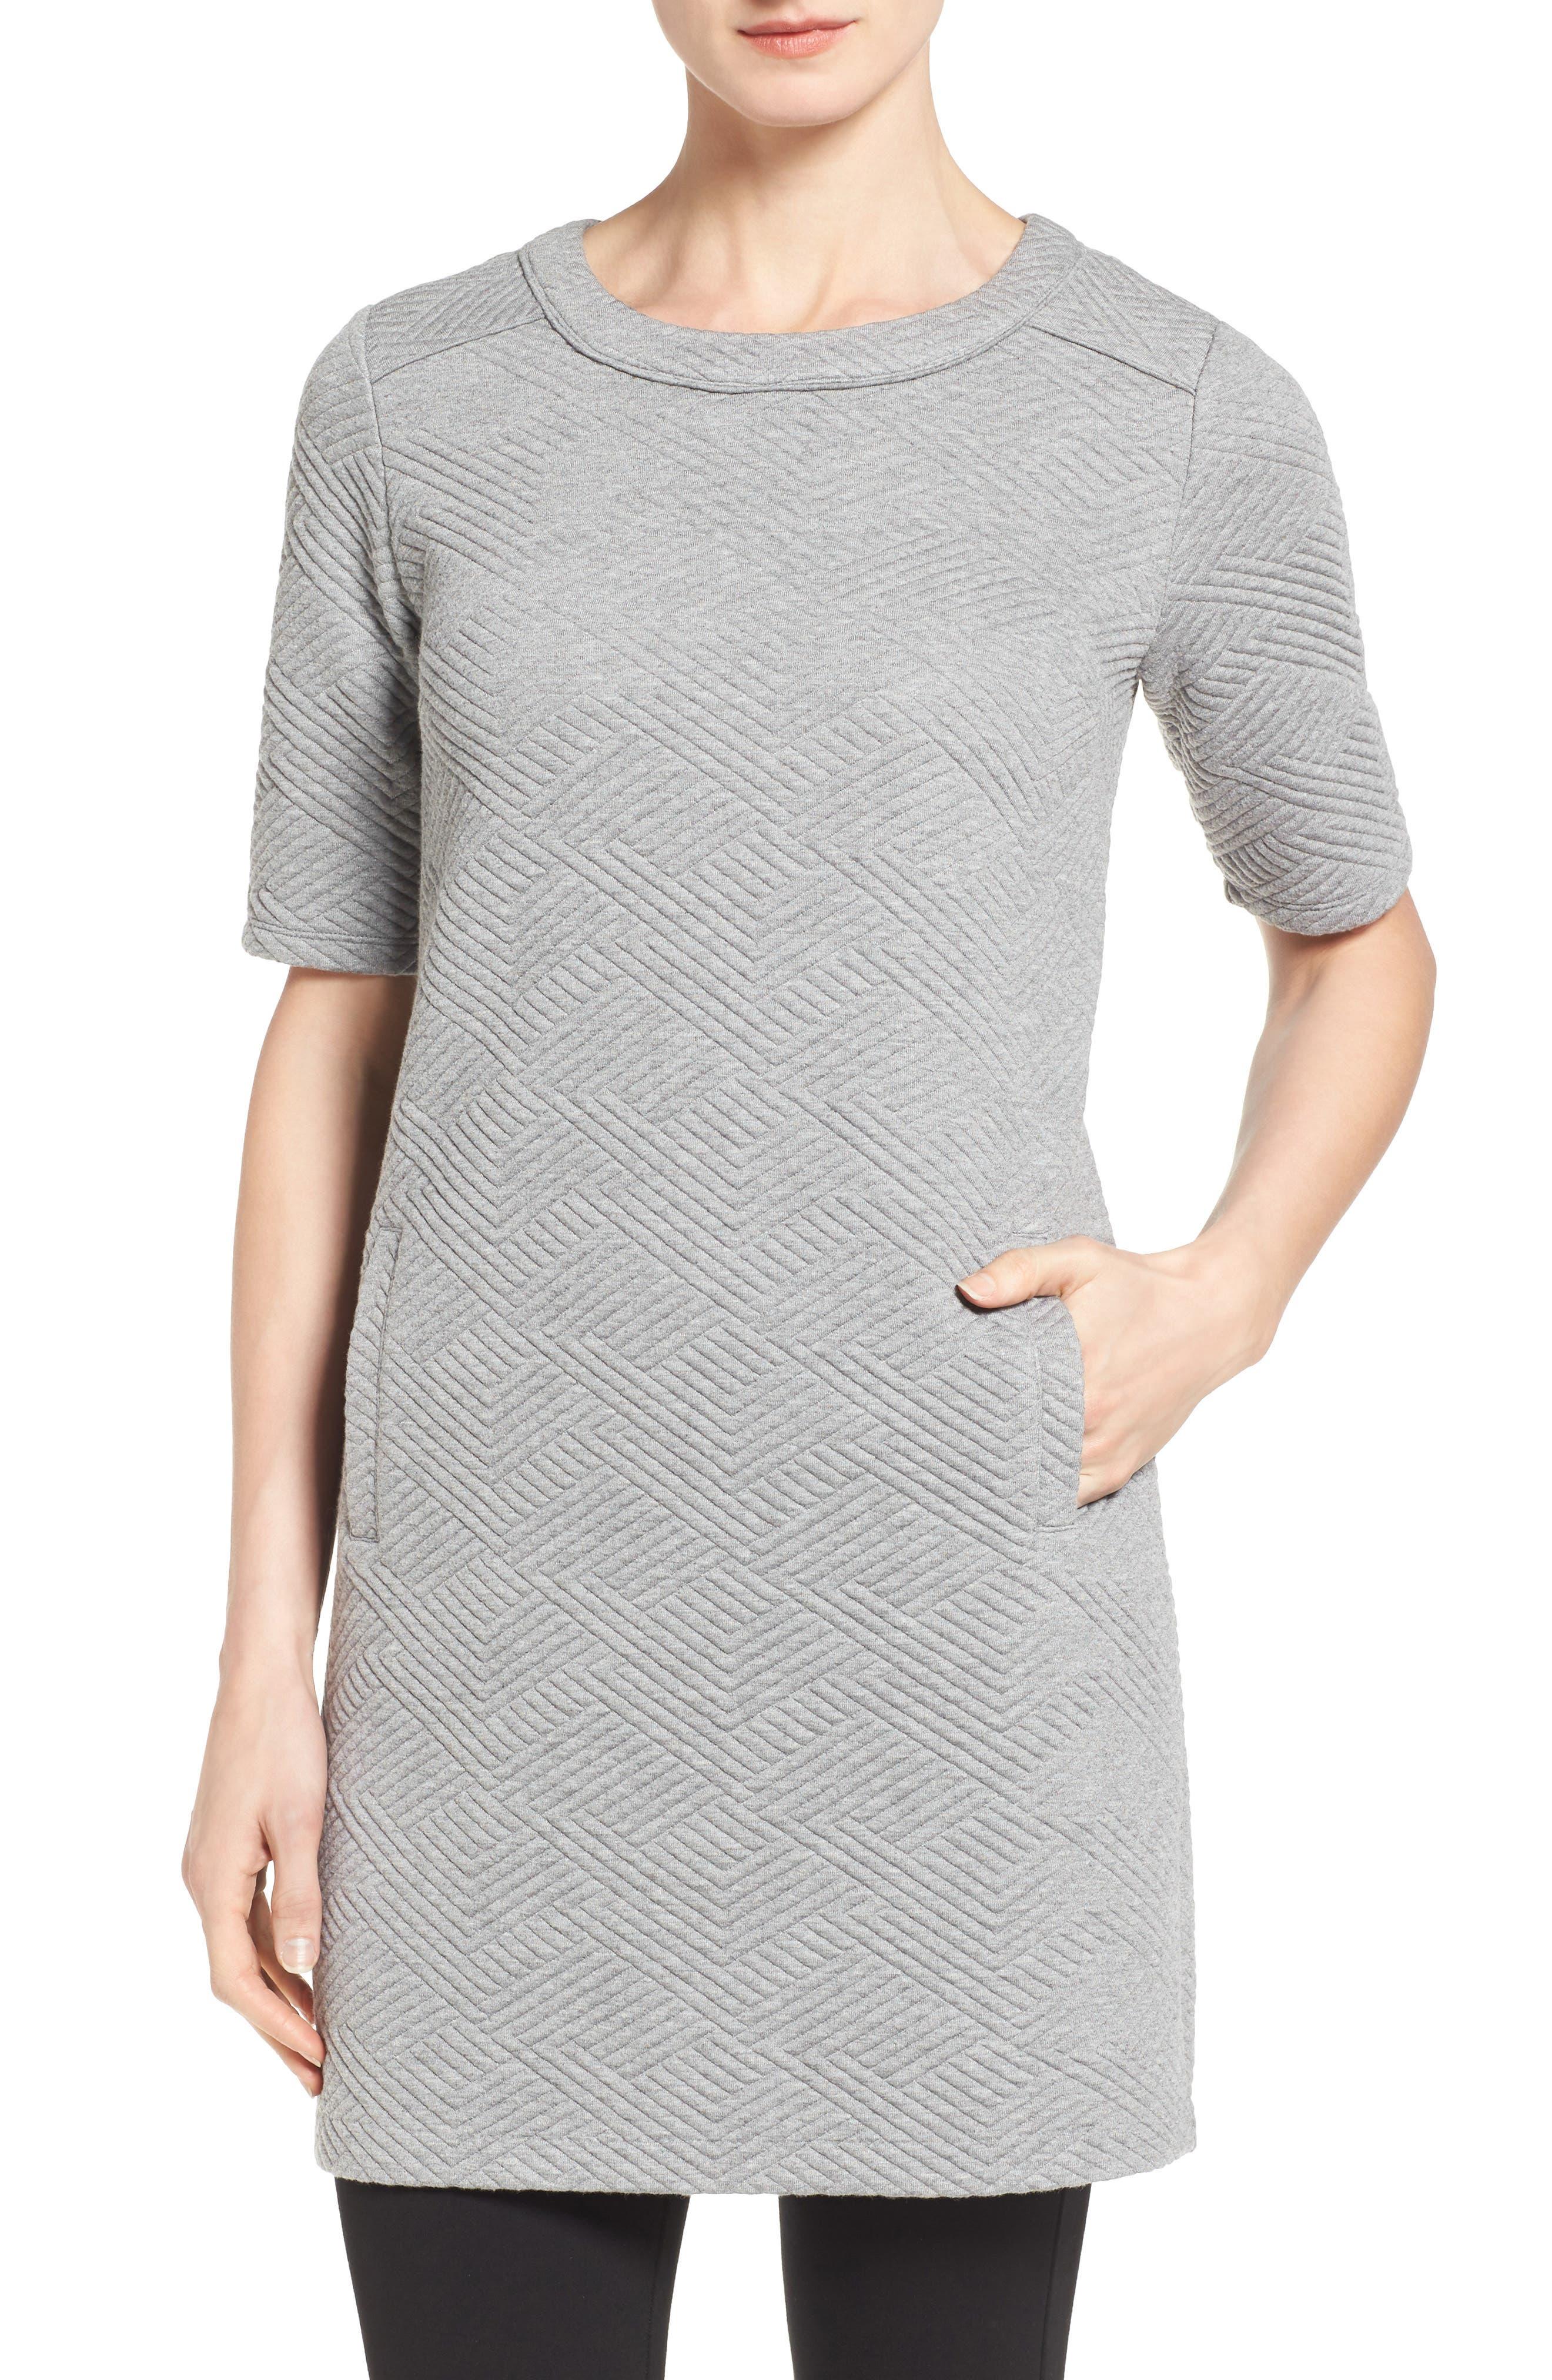 Textured Elbow Sleeve Tunic Dress, Main, color, 030